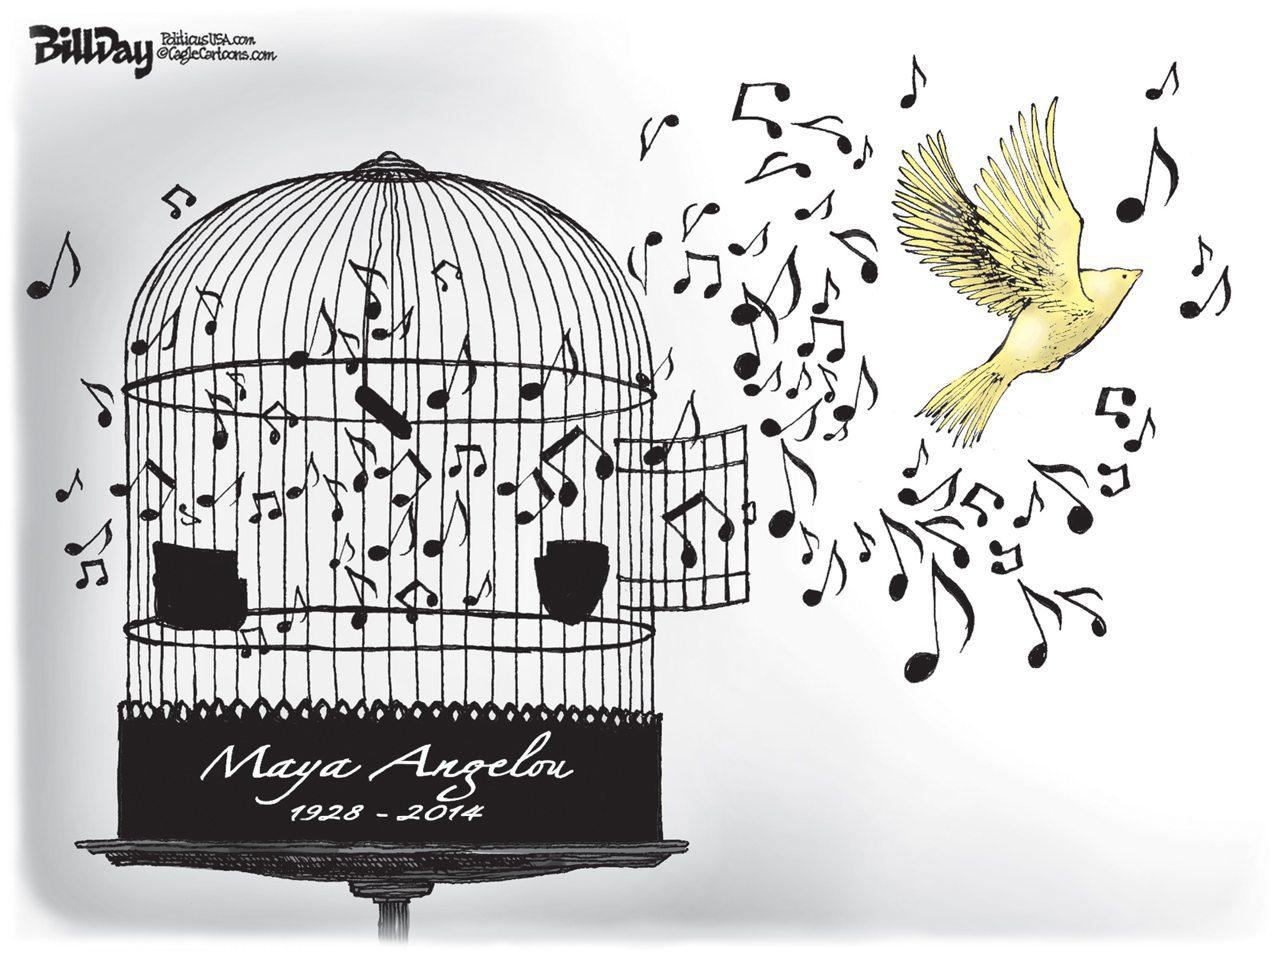 Editorial Cartoon Caged Bird Sings